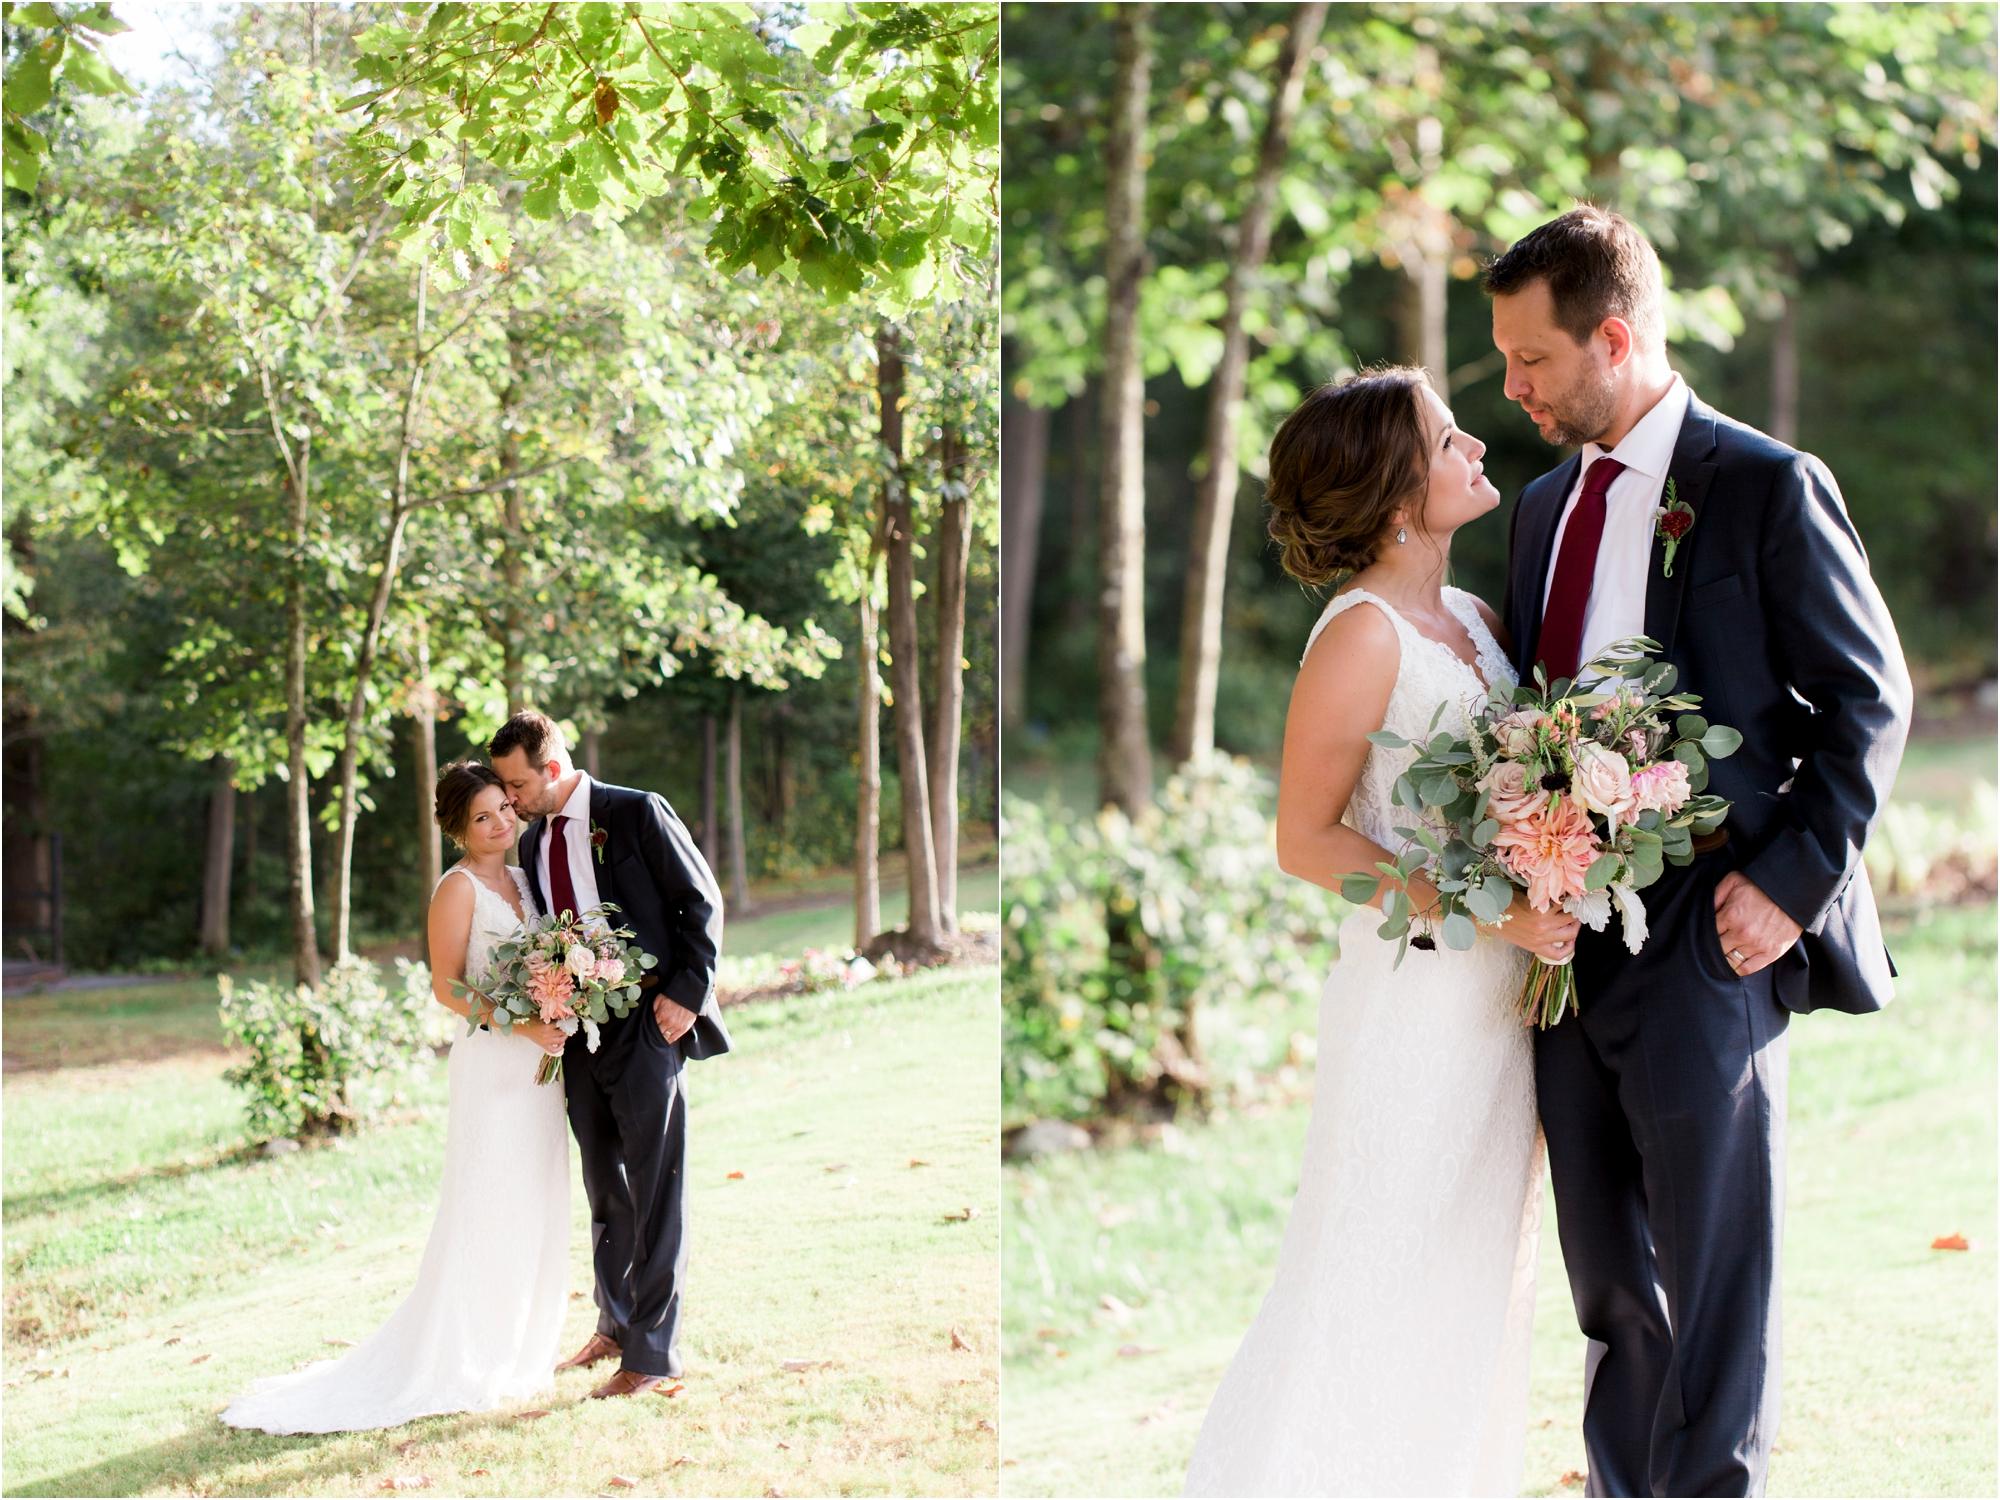 brittany-brad-ashton-creek-vineyard-richmond-virginia-wedding_0039.jpg